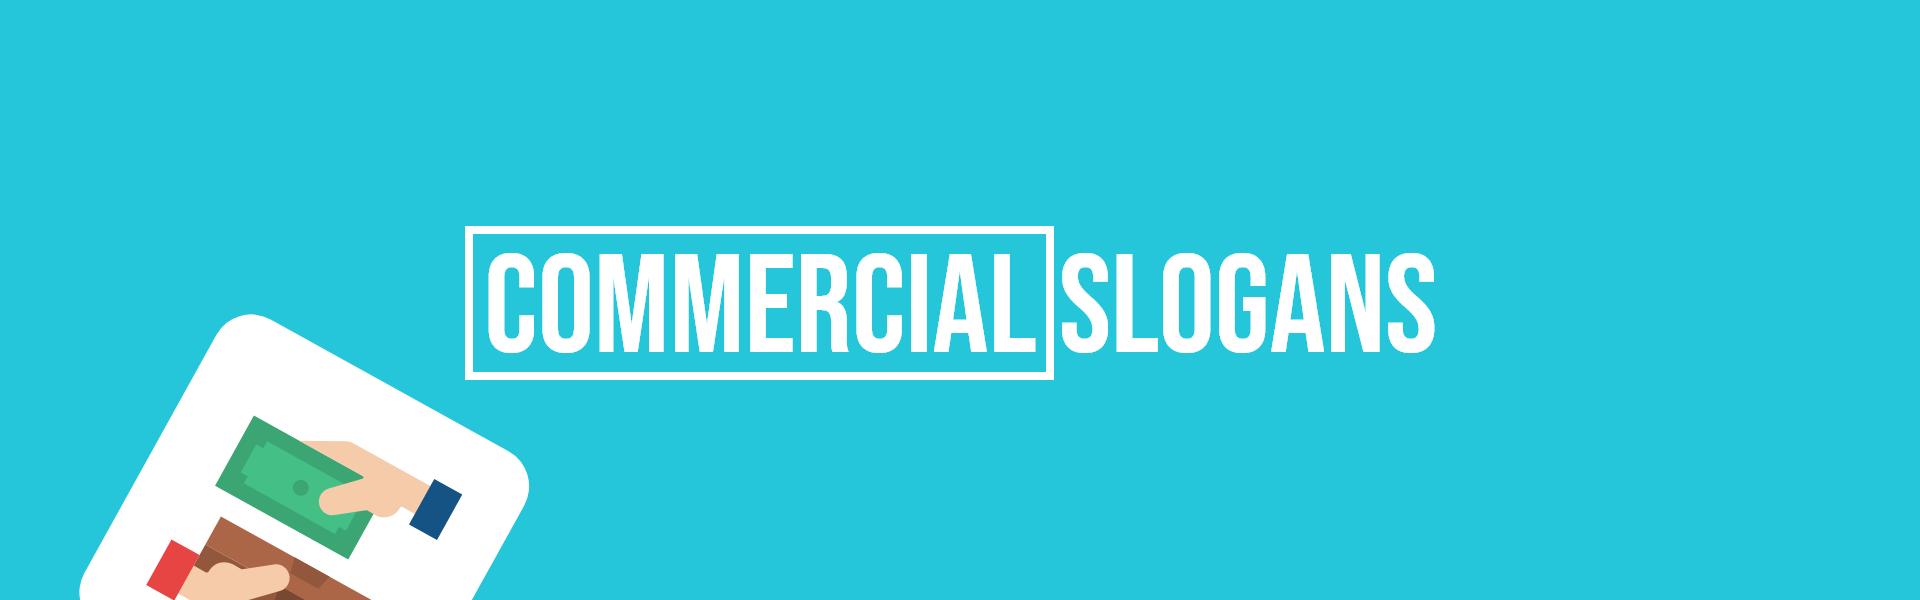 commercial slogans taglines